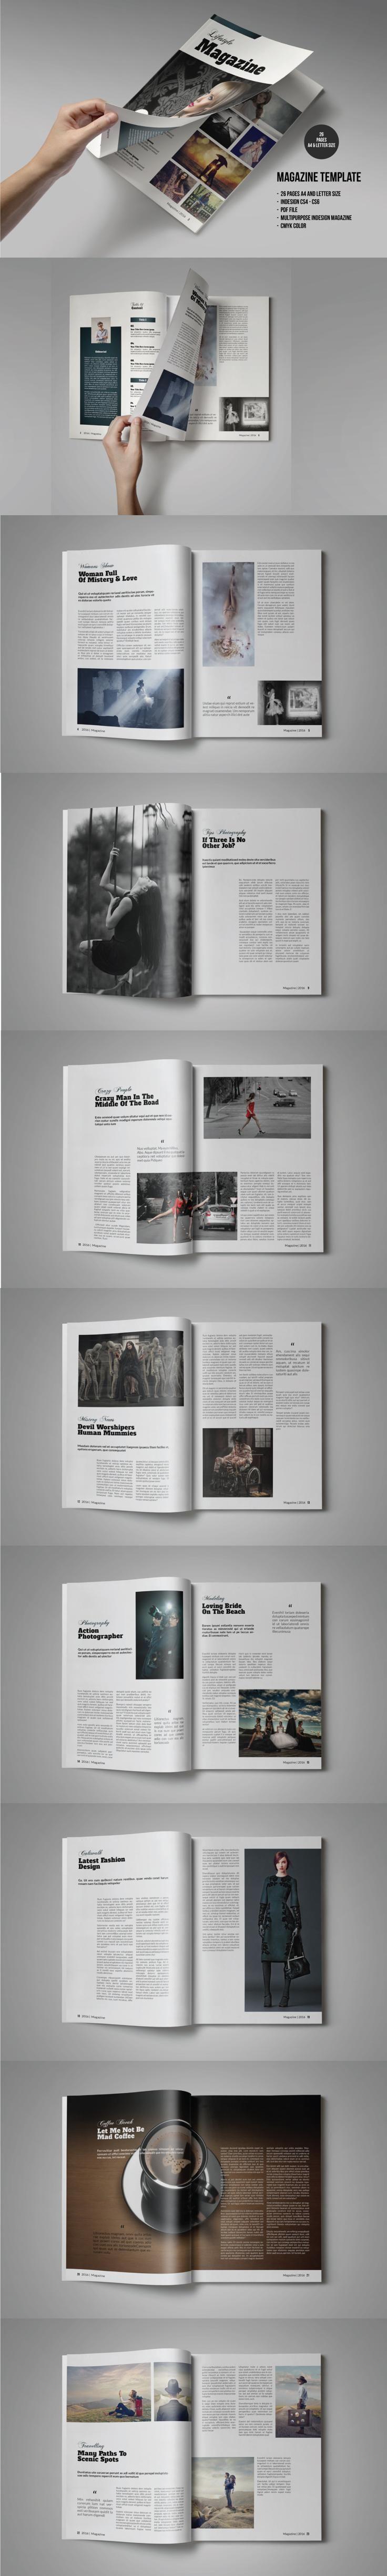 #magazine #design from Leparte | DOWNLOAD: https://creativemarket.com/Leparte/470783-Multipurpose-Magazine-Template?u=zsoltczigler